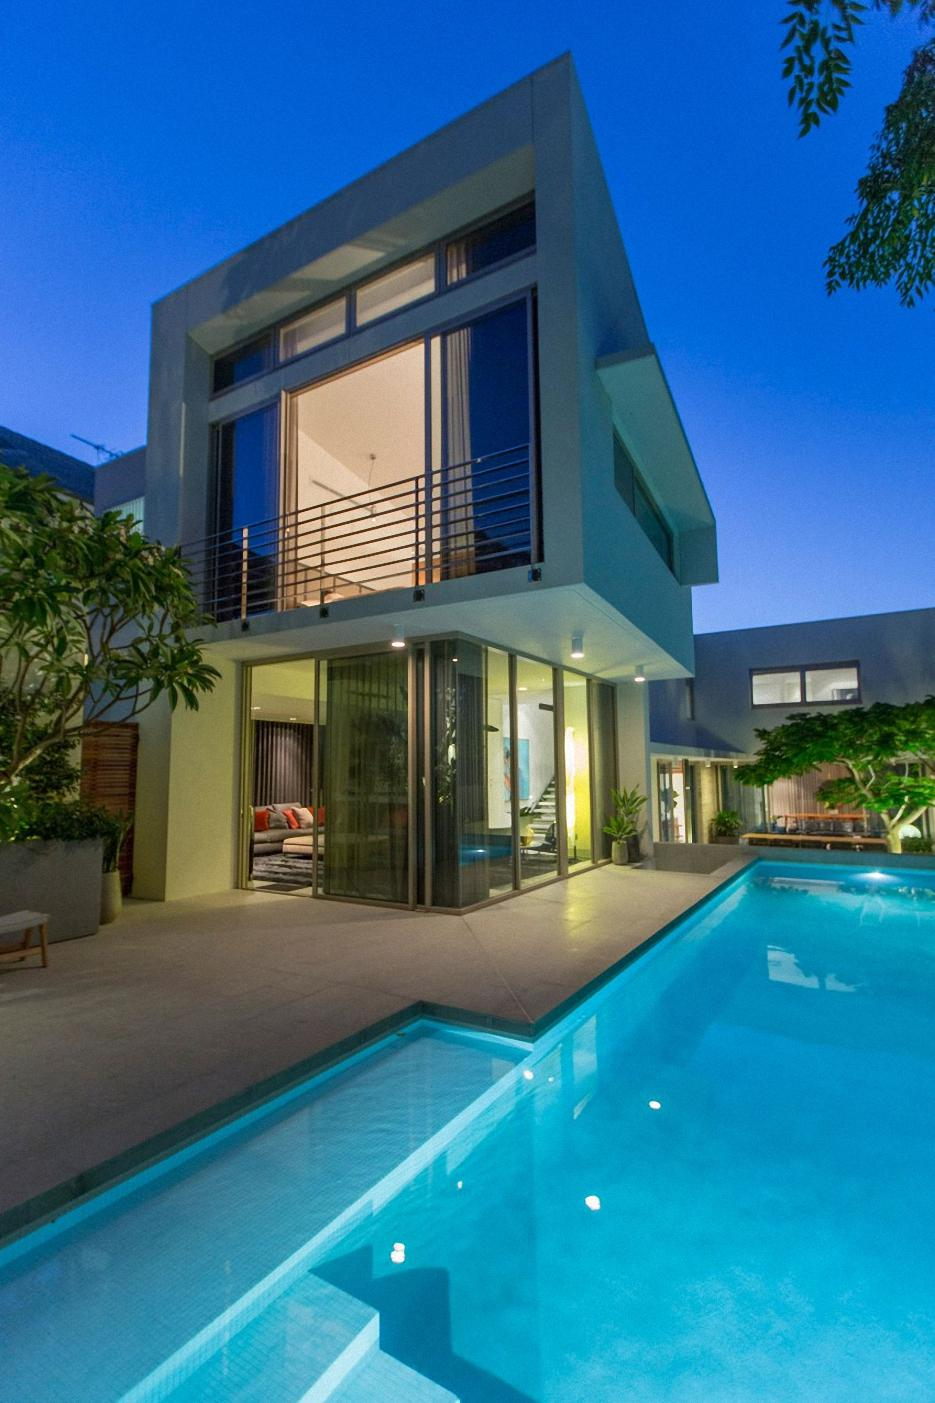 luxury house swimming pool modern design